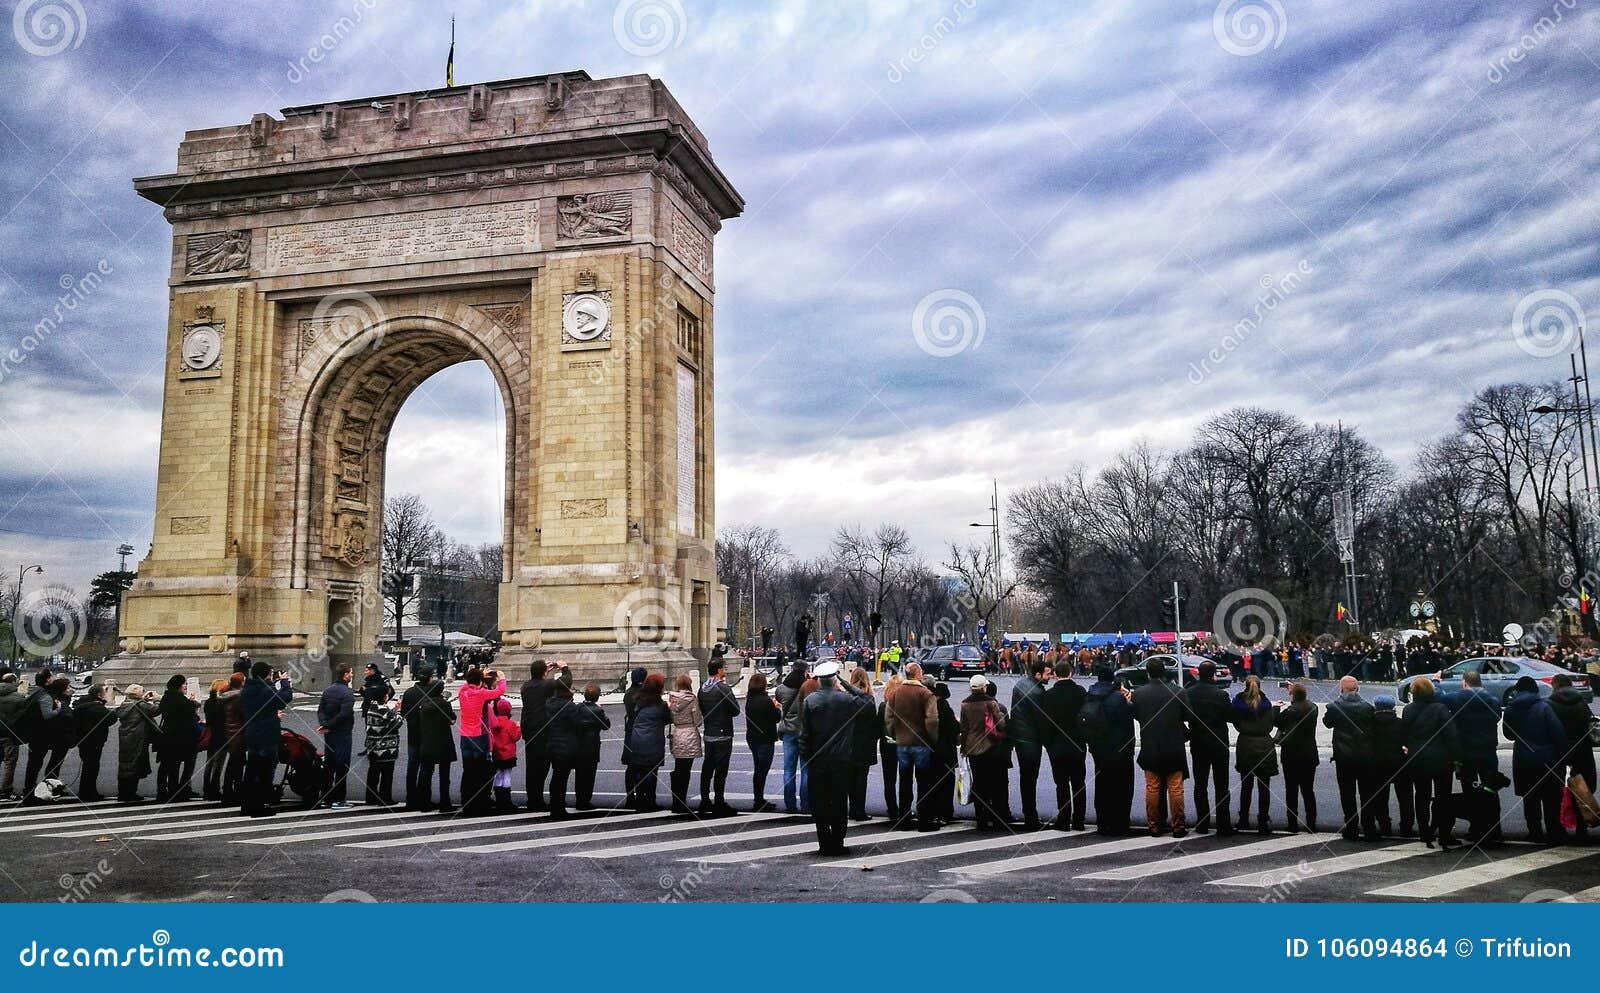 King Mihai I Funerals - Arch de Triumph Bucharest Romania